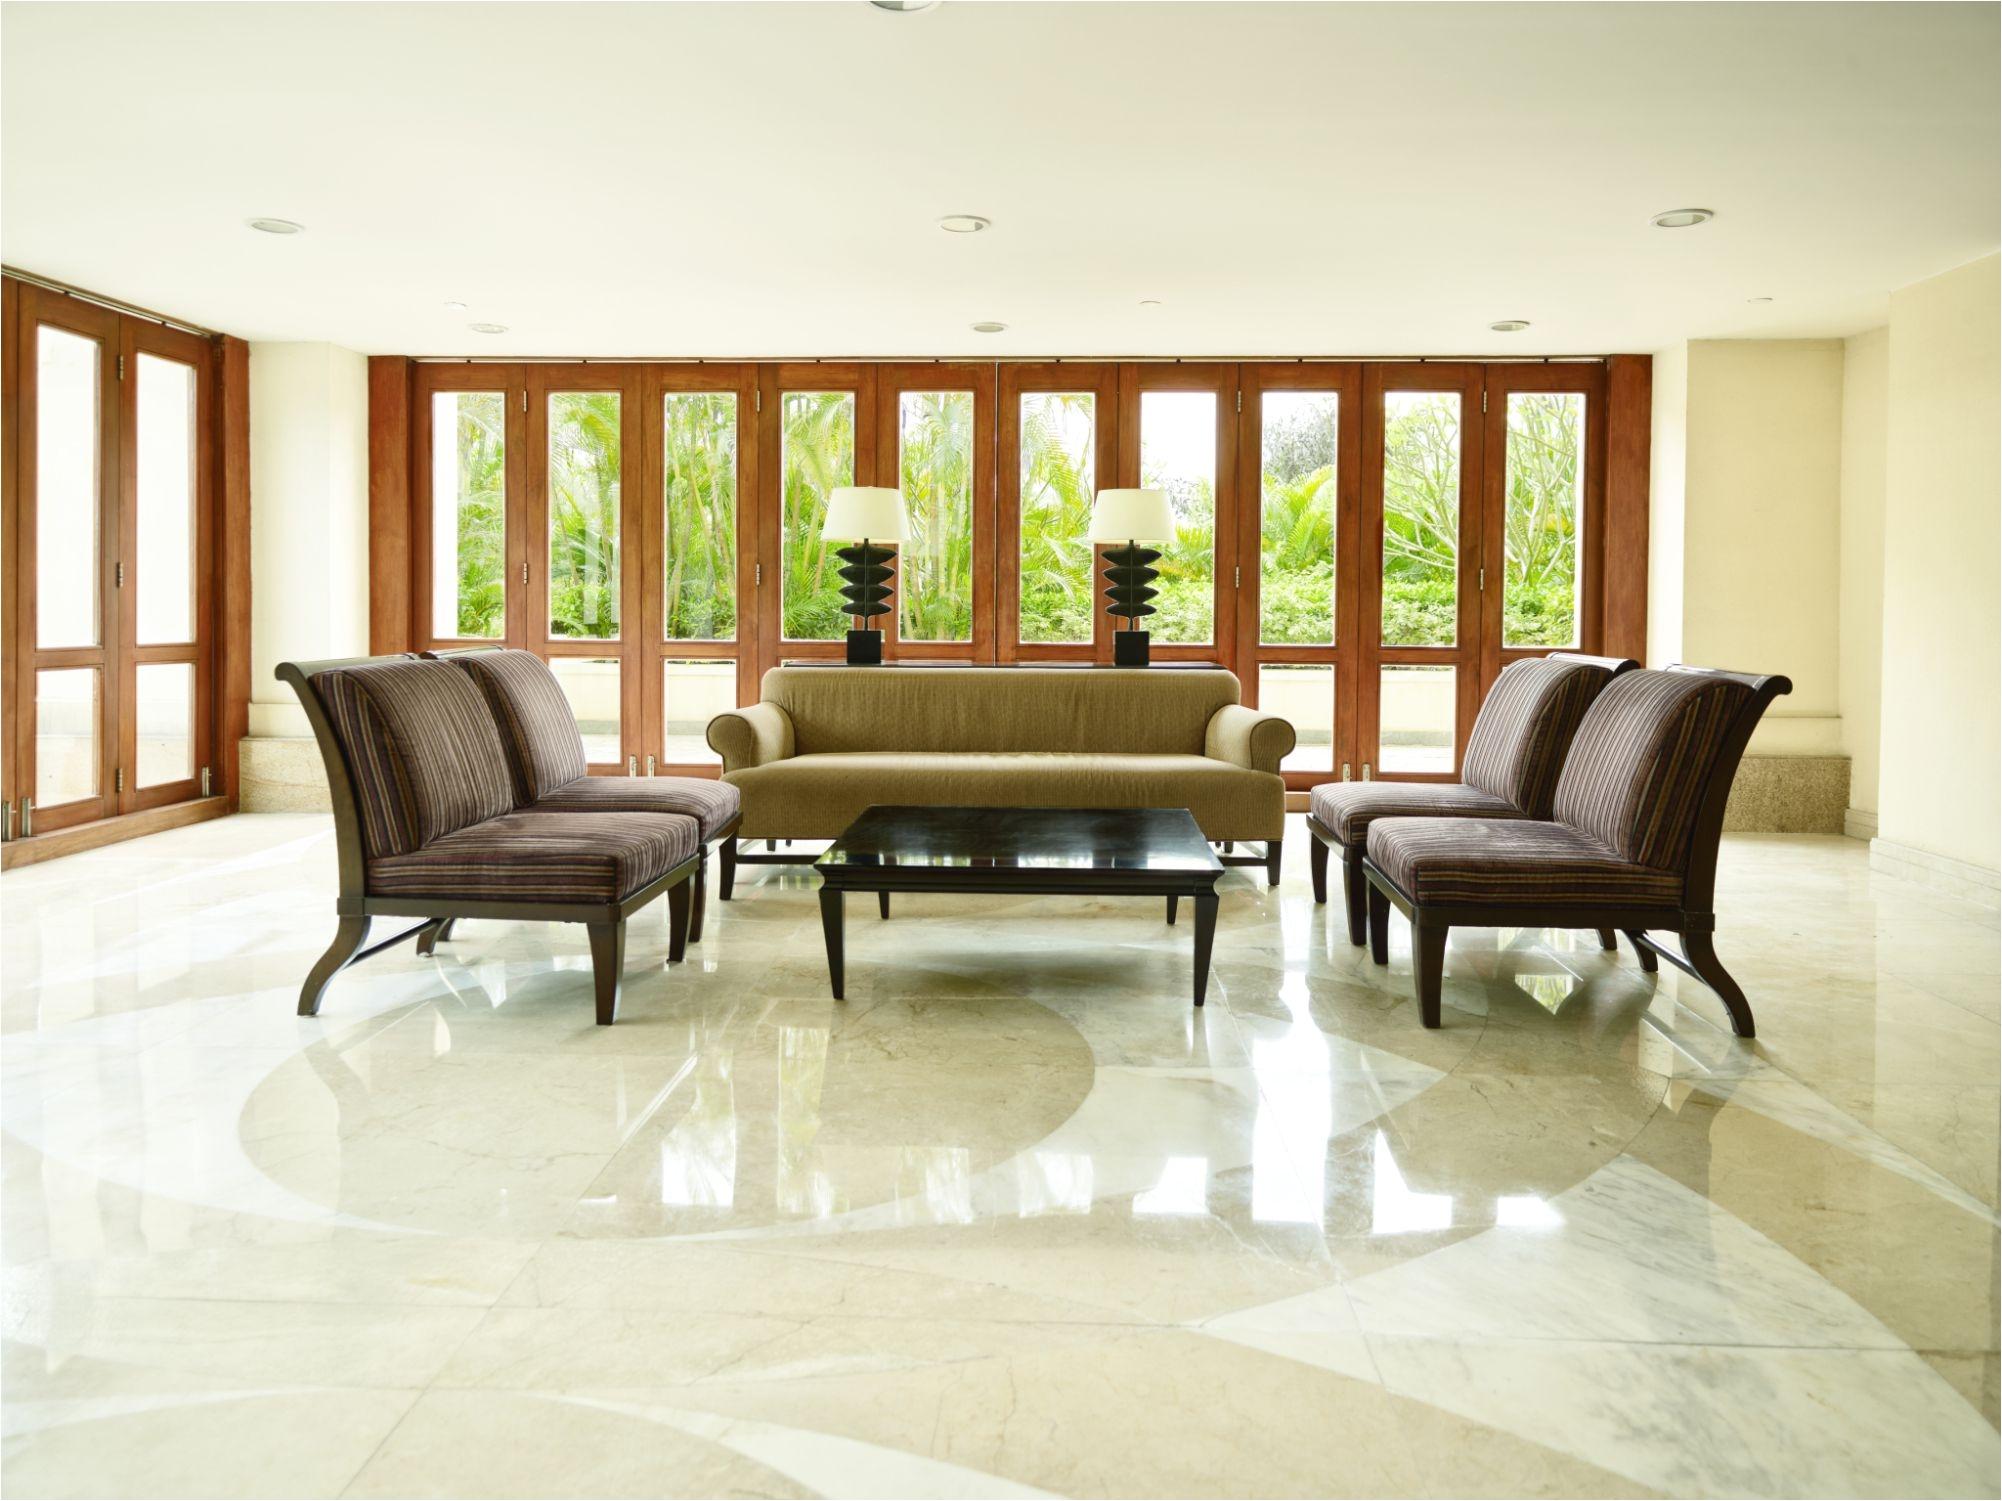 traditional flat drywall ceiling 185211056 56a4a0d55f9b58b7d0d7e4bd jpg